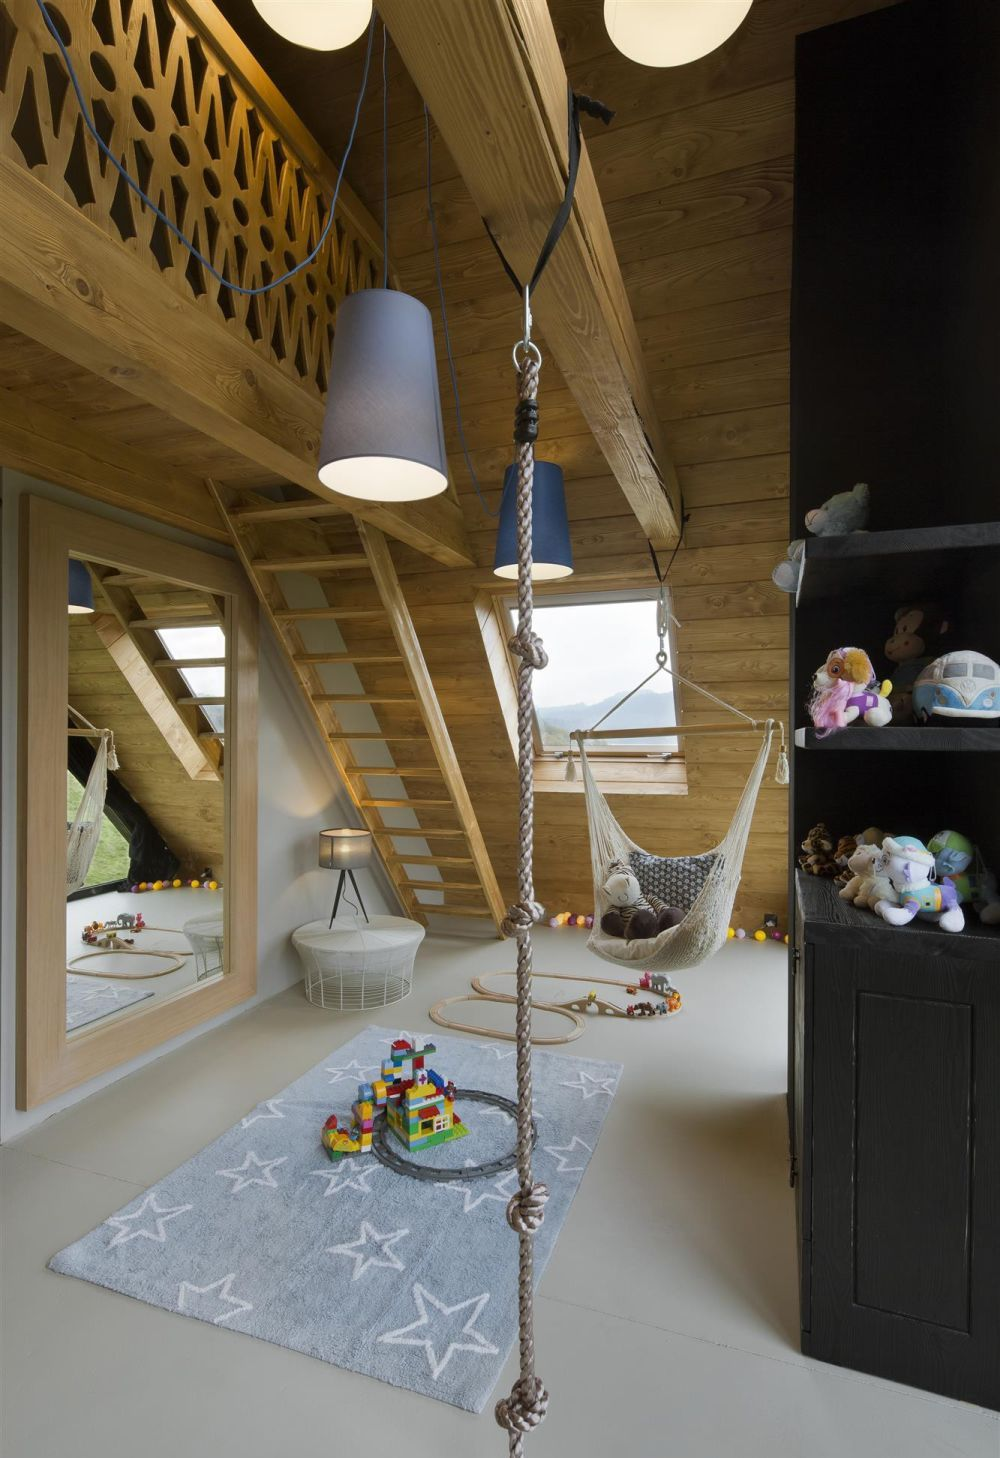 adelaparvu.com despre casa contemporana inspirata de arhitectura traditionala, Design Hola Design Studio, arhitectura Exterior, Foto Yassen Hristov (9)